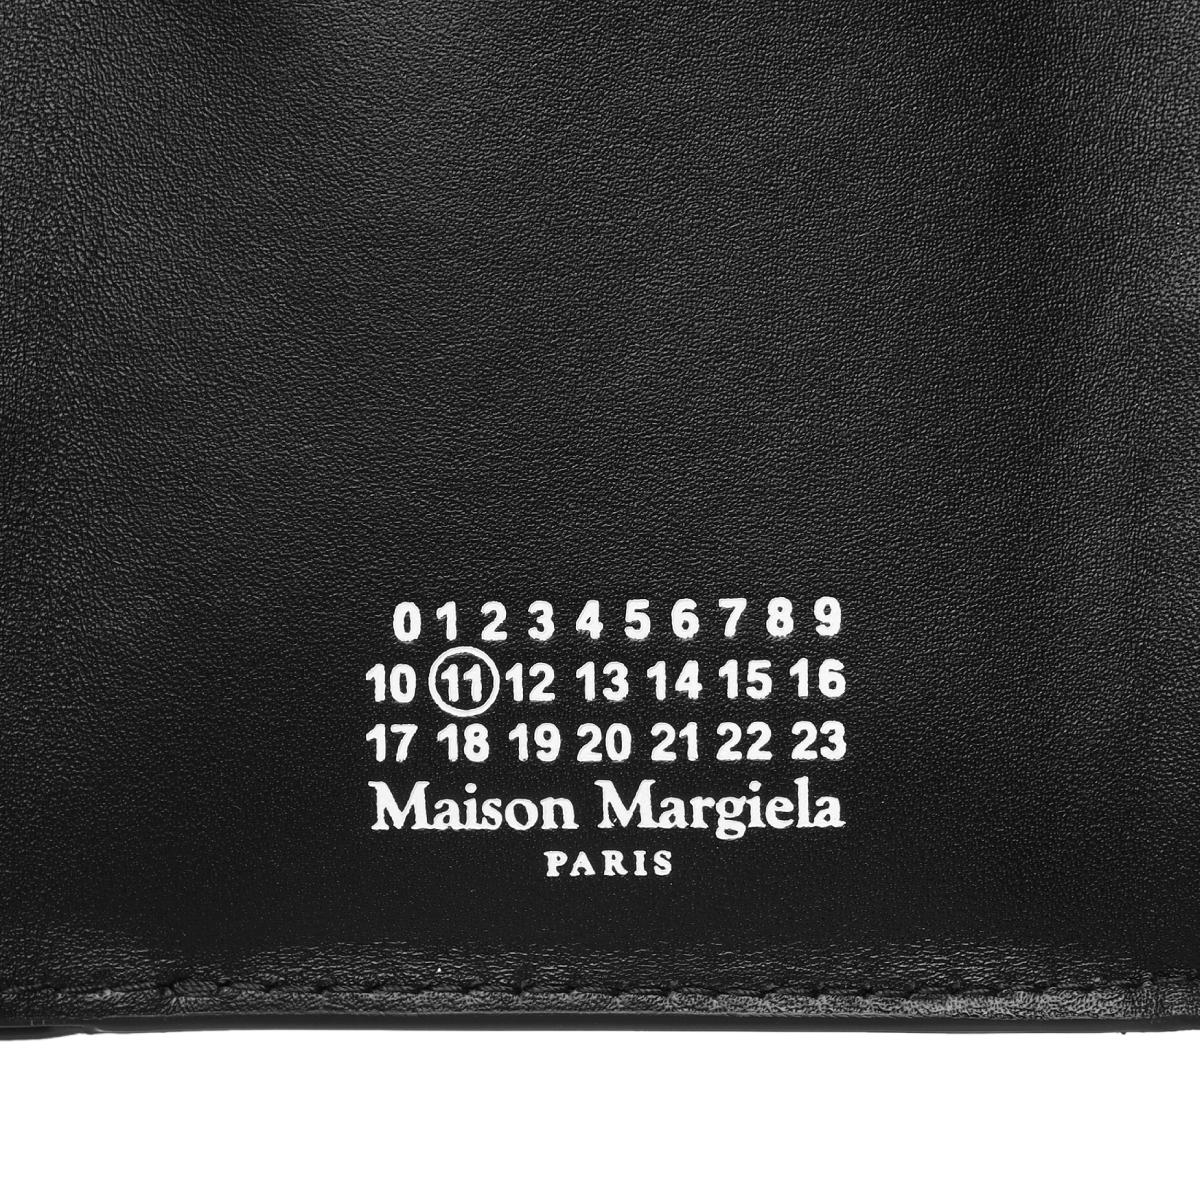 MAISON MARGIELA メゾン マルジェラ | ライン11 三つ折り財布